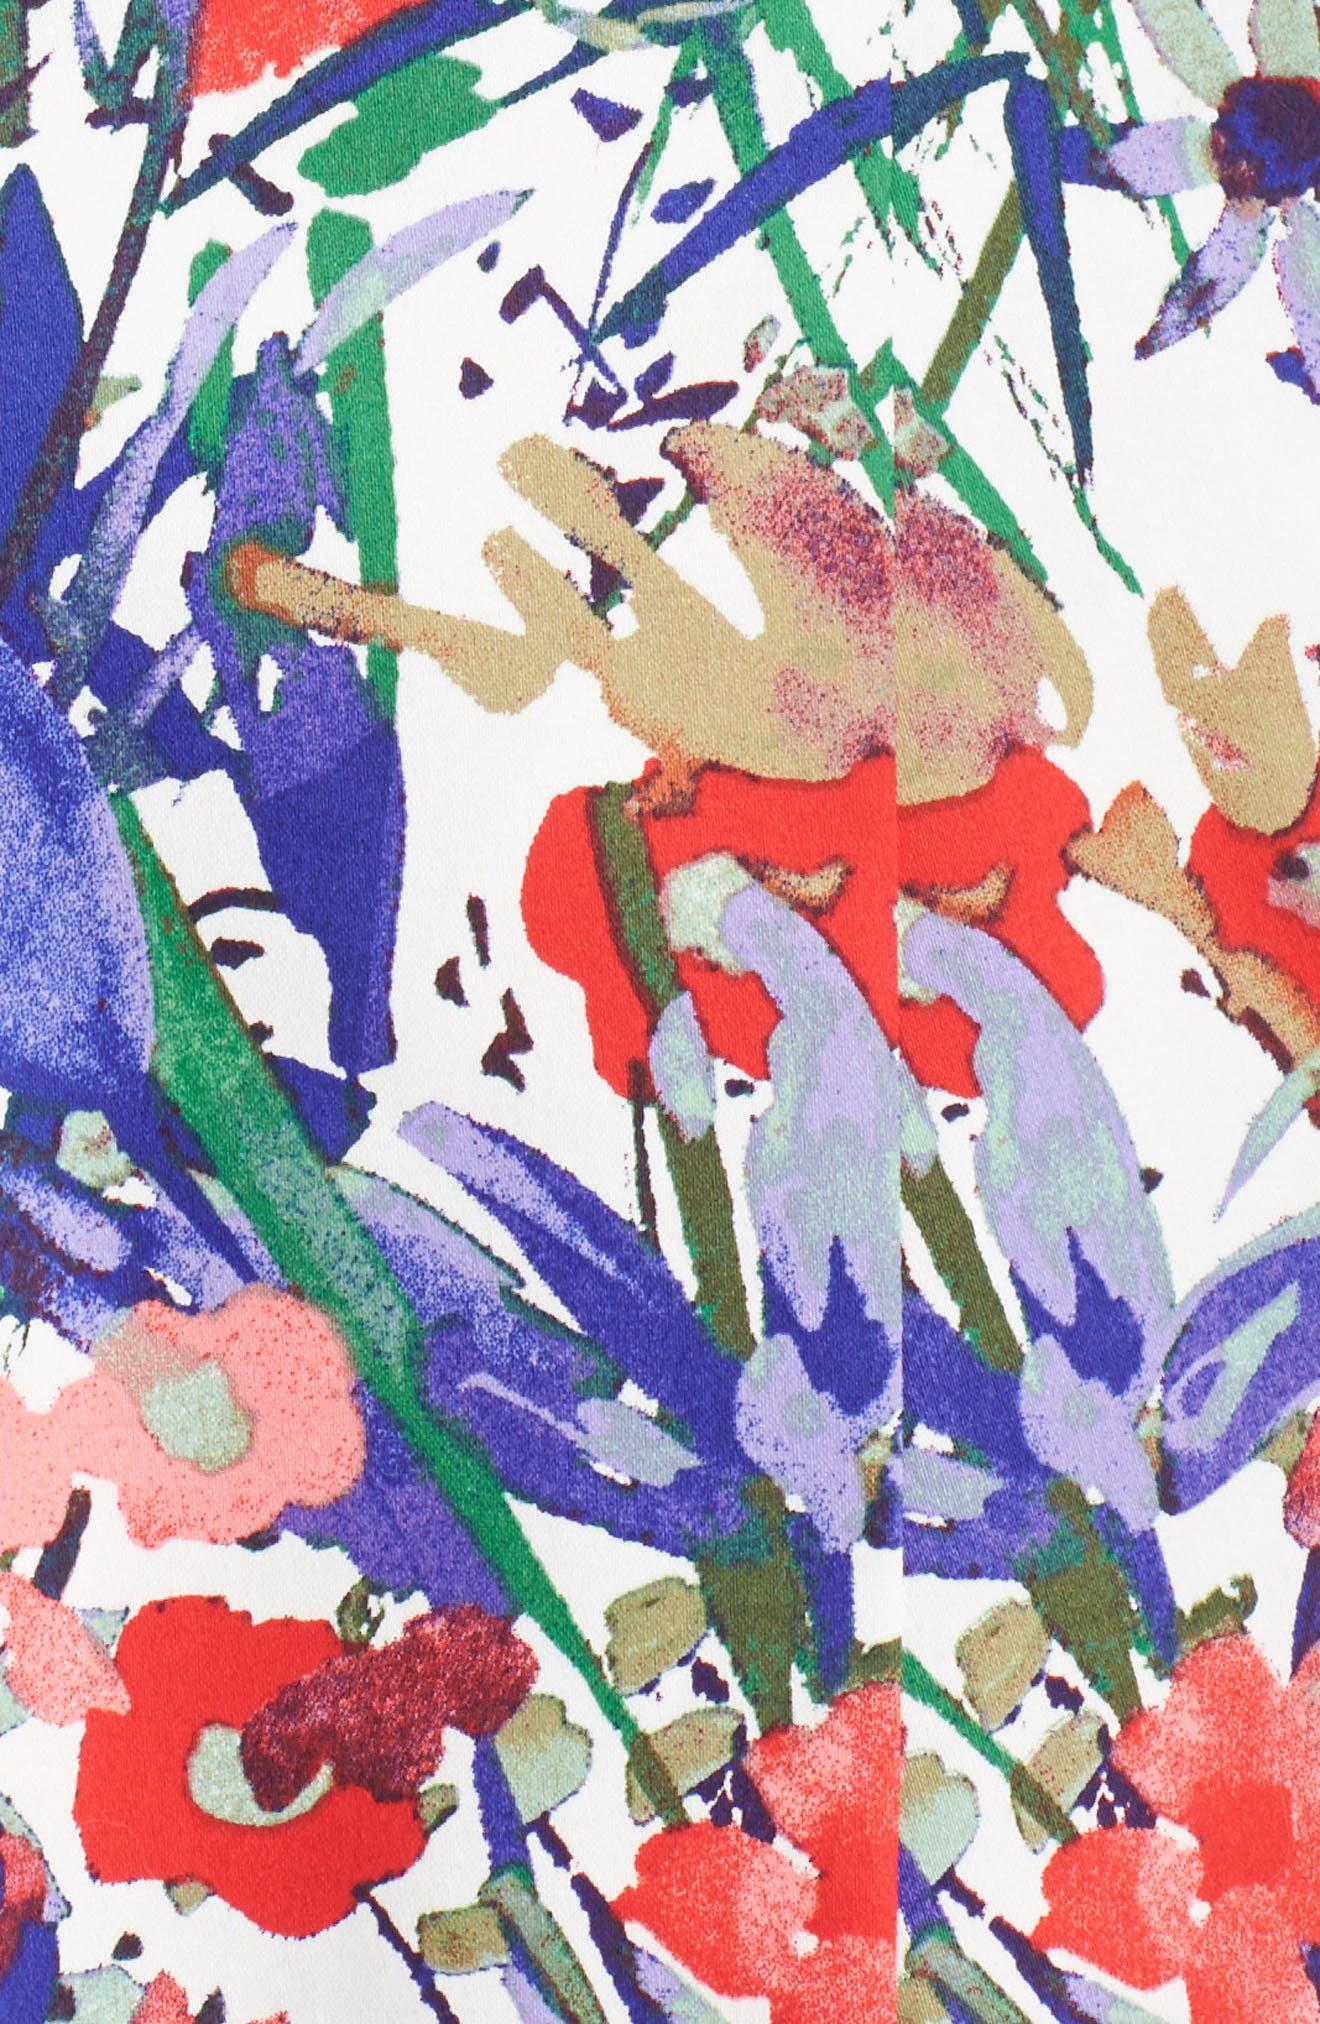 Cottage Garden Fit & Flare Dress,                             Alternate thumbnail 5, color,                             163